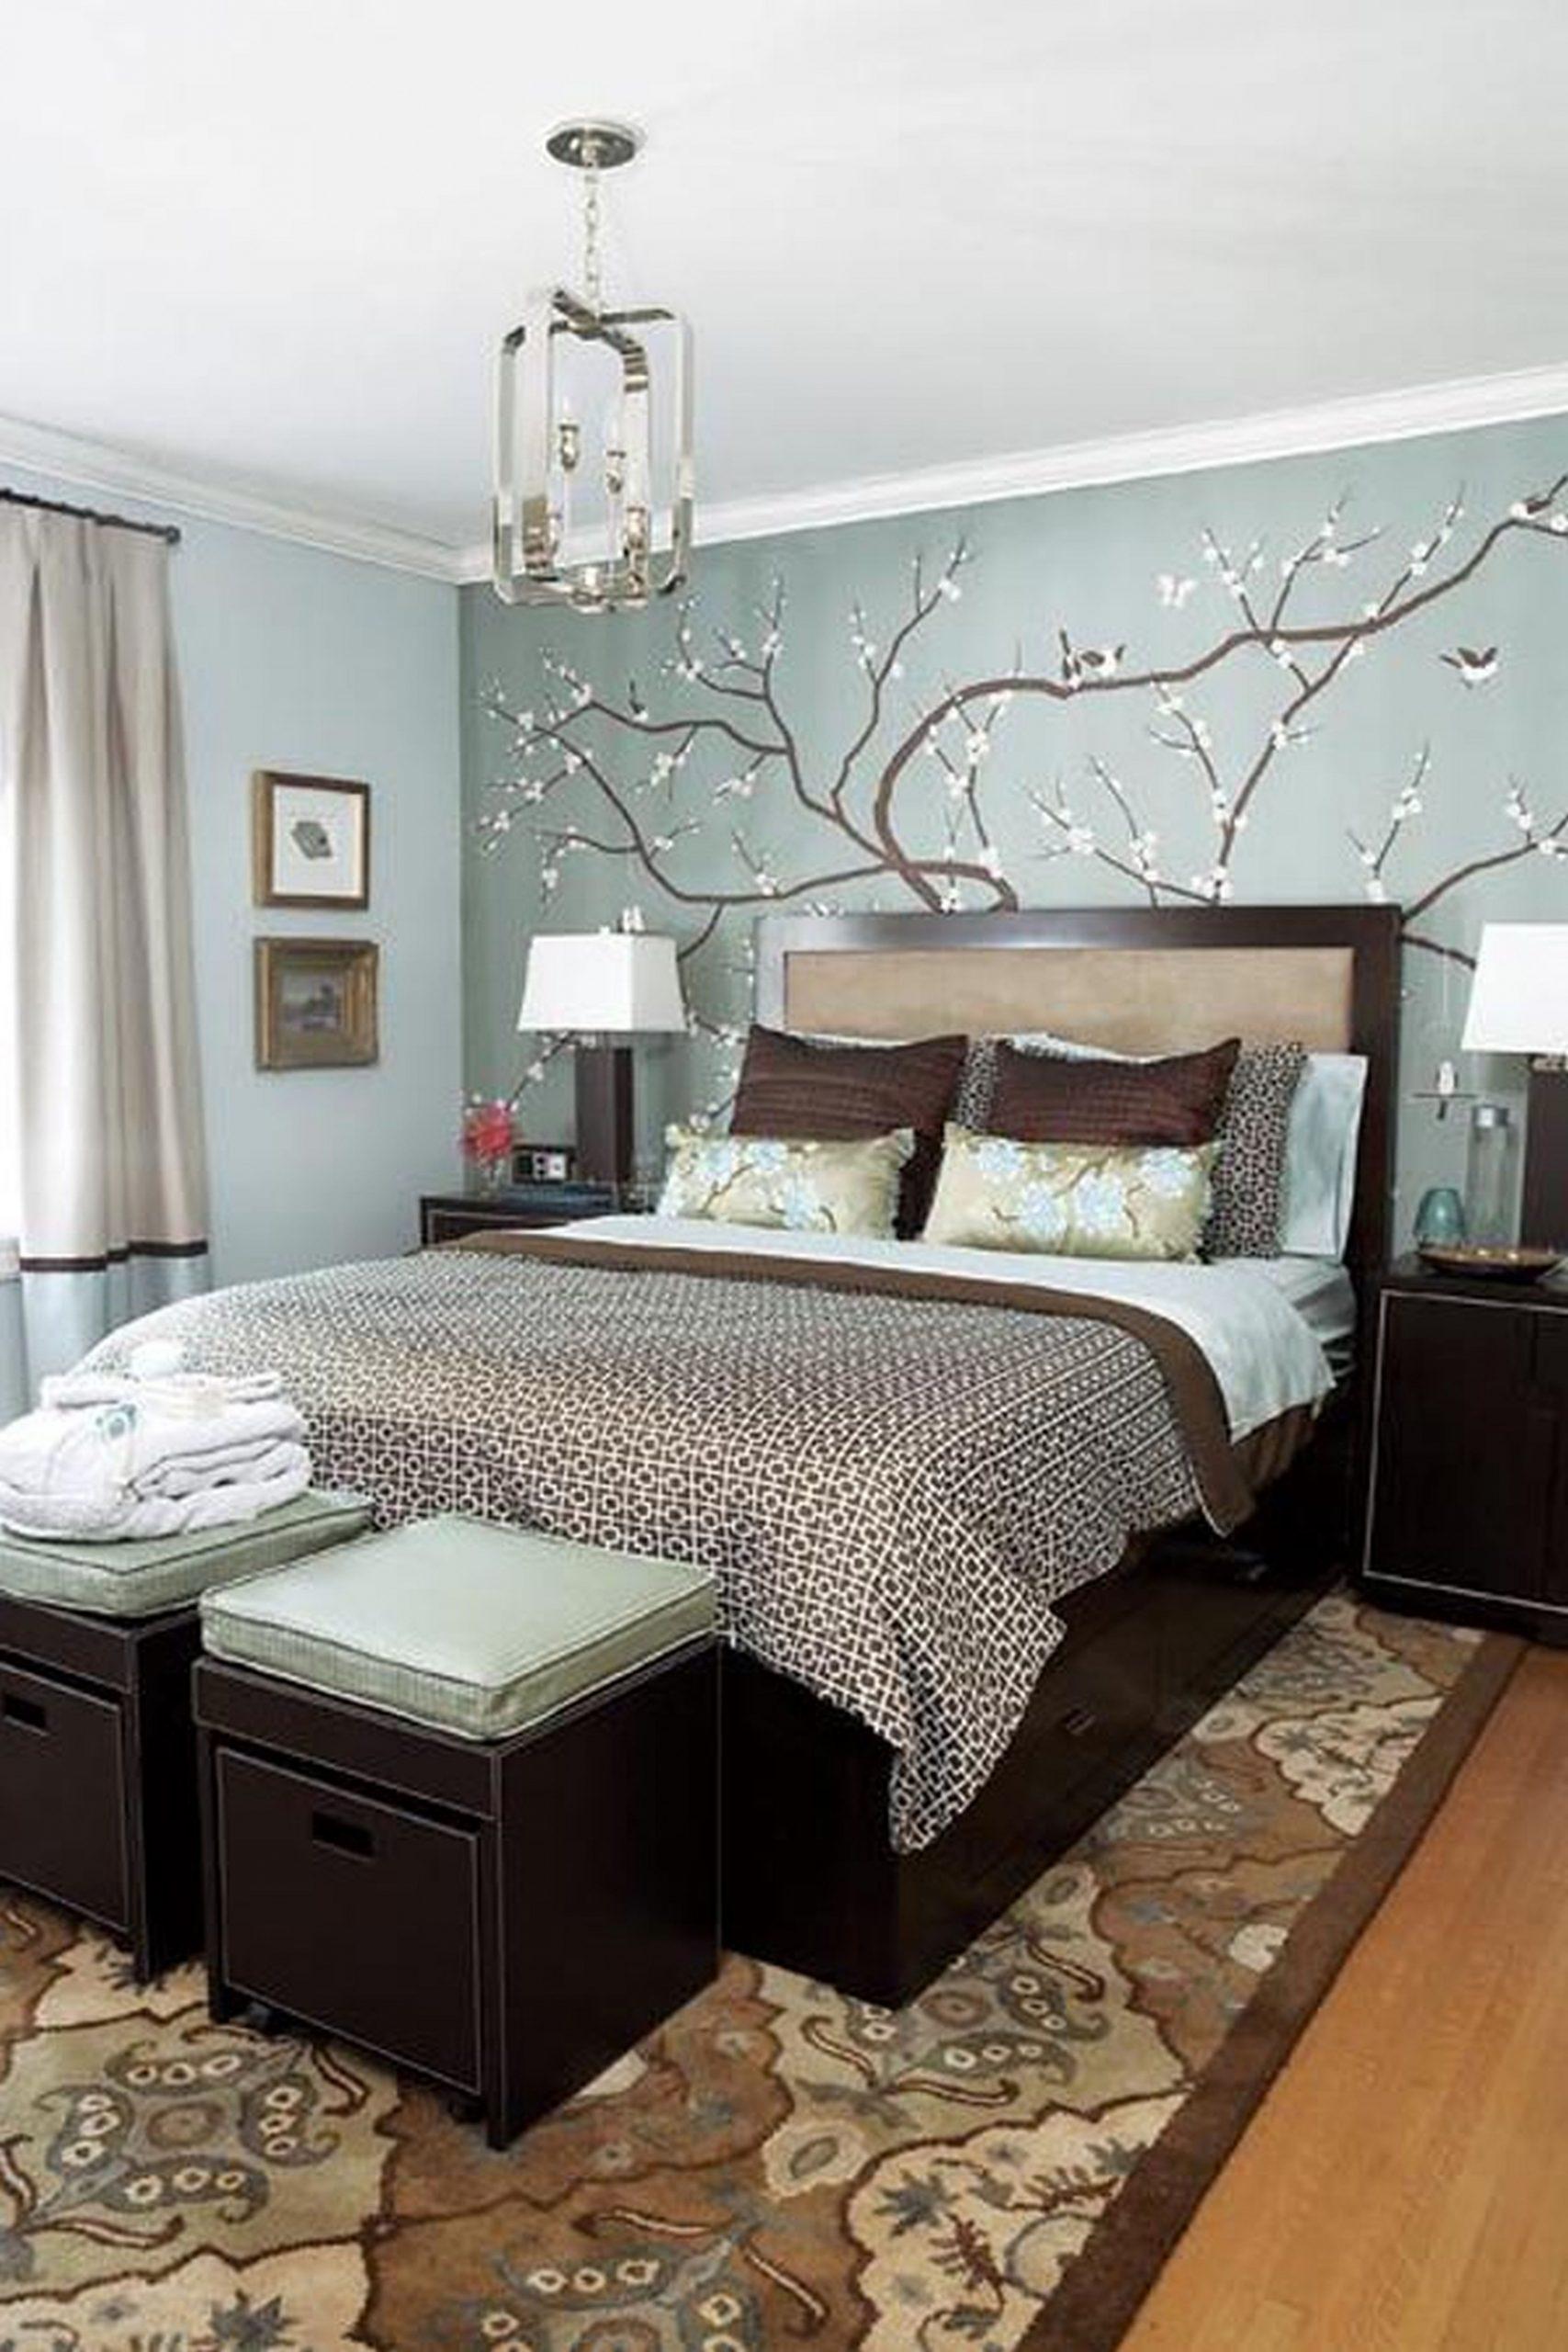 Decorate Bedroom Light Blue Walls  Home Decor - Bedroom Ideas Light Blue Walls